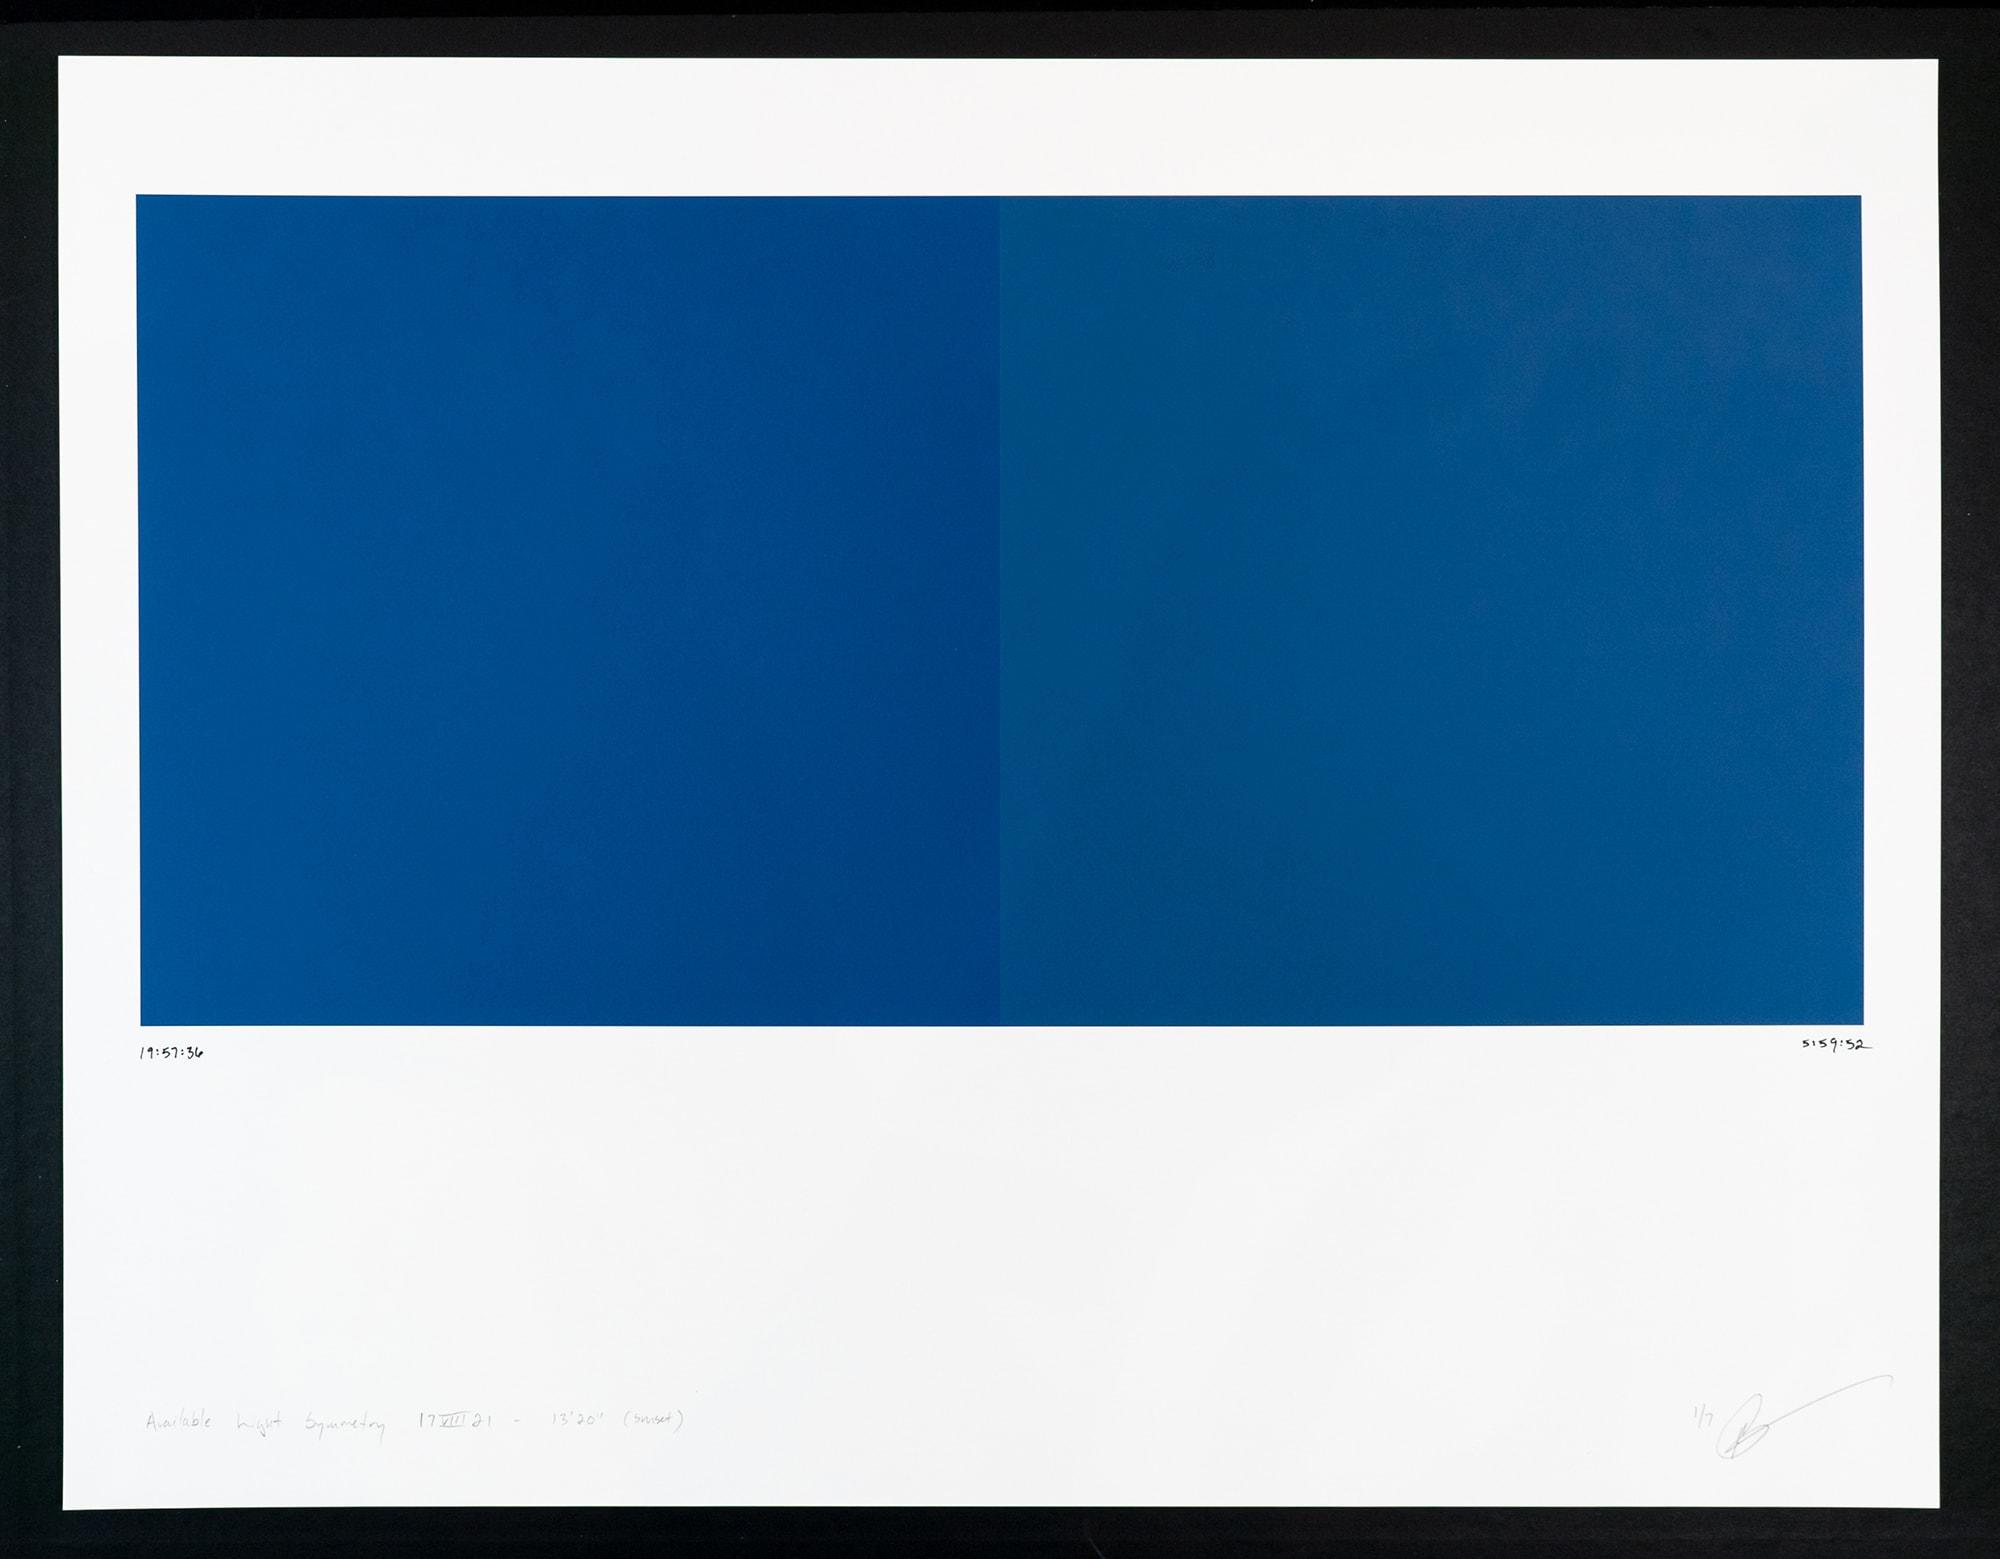 Randy Gibson : Available Light Symmetry 17VIII21 - 13'20″ (Sunset)